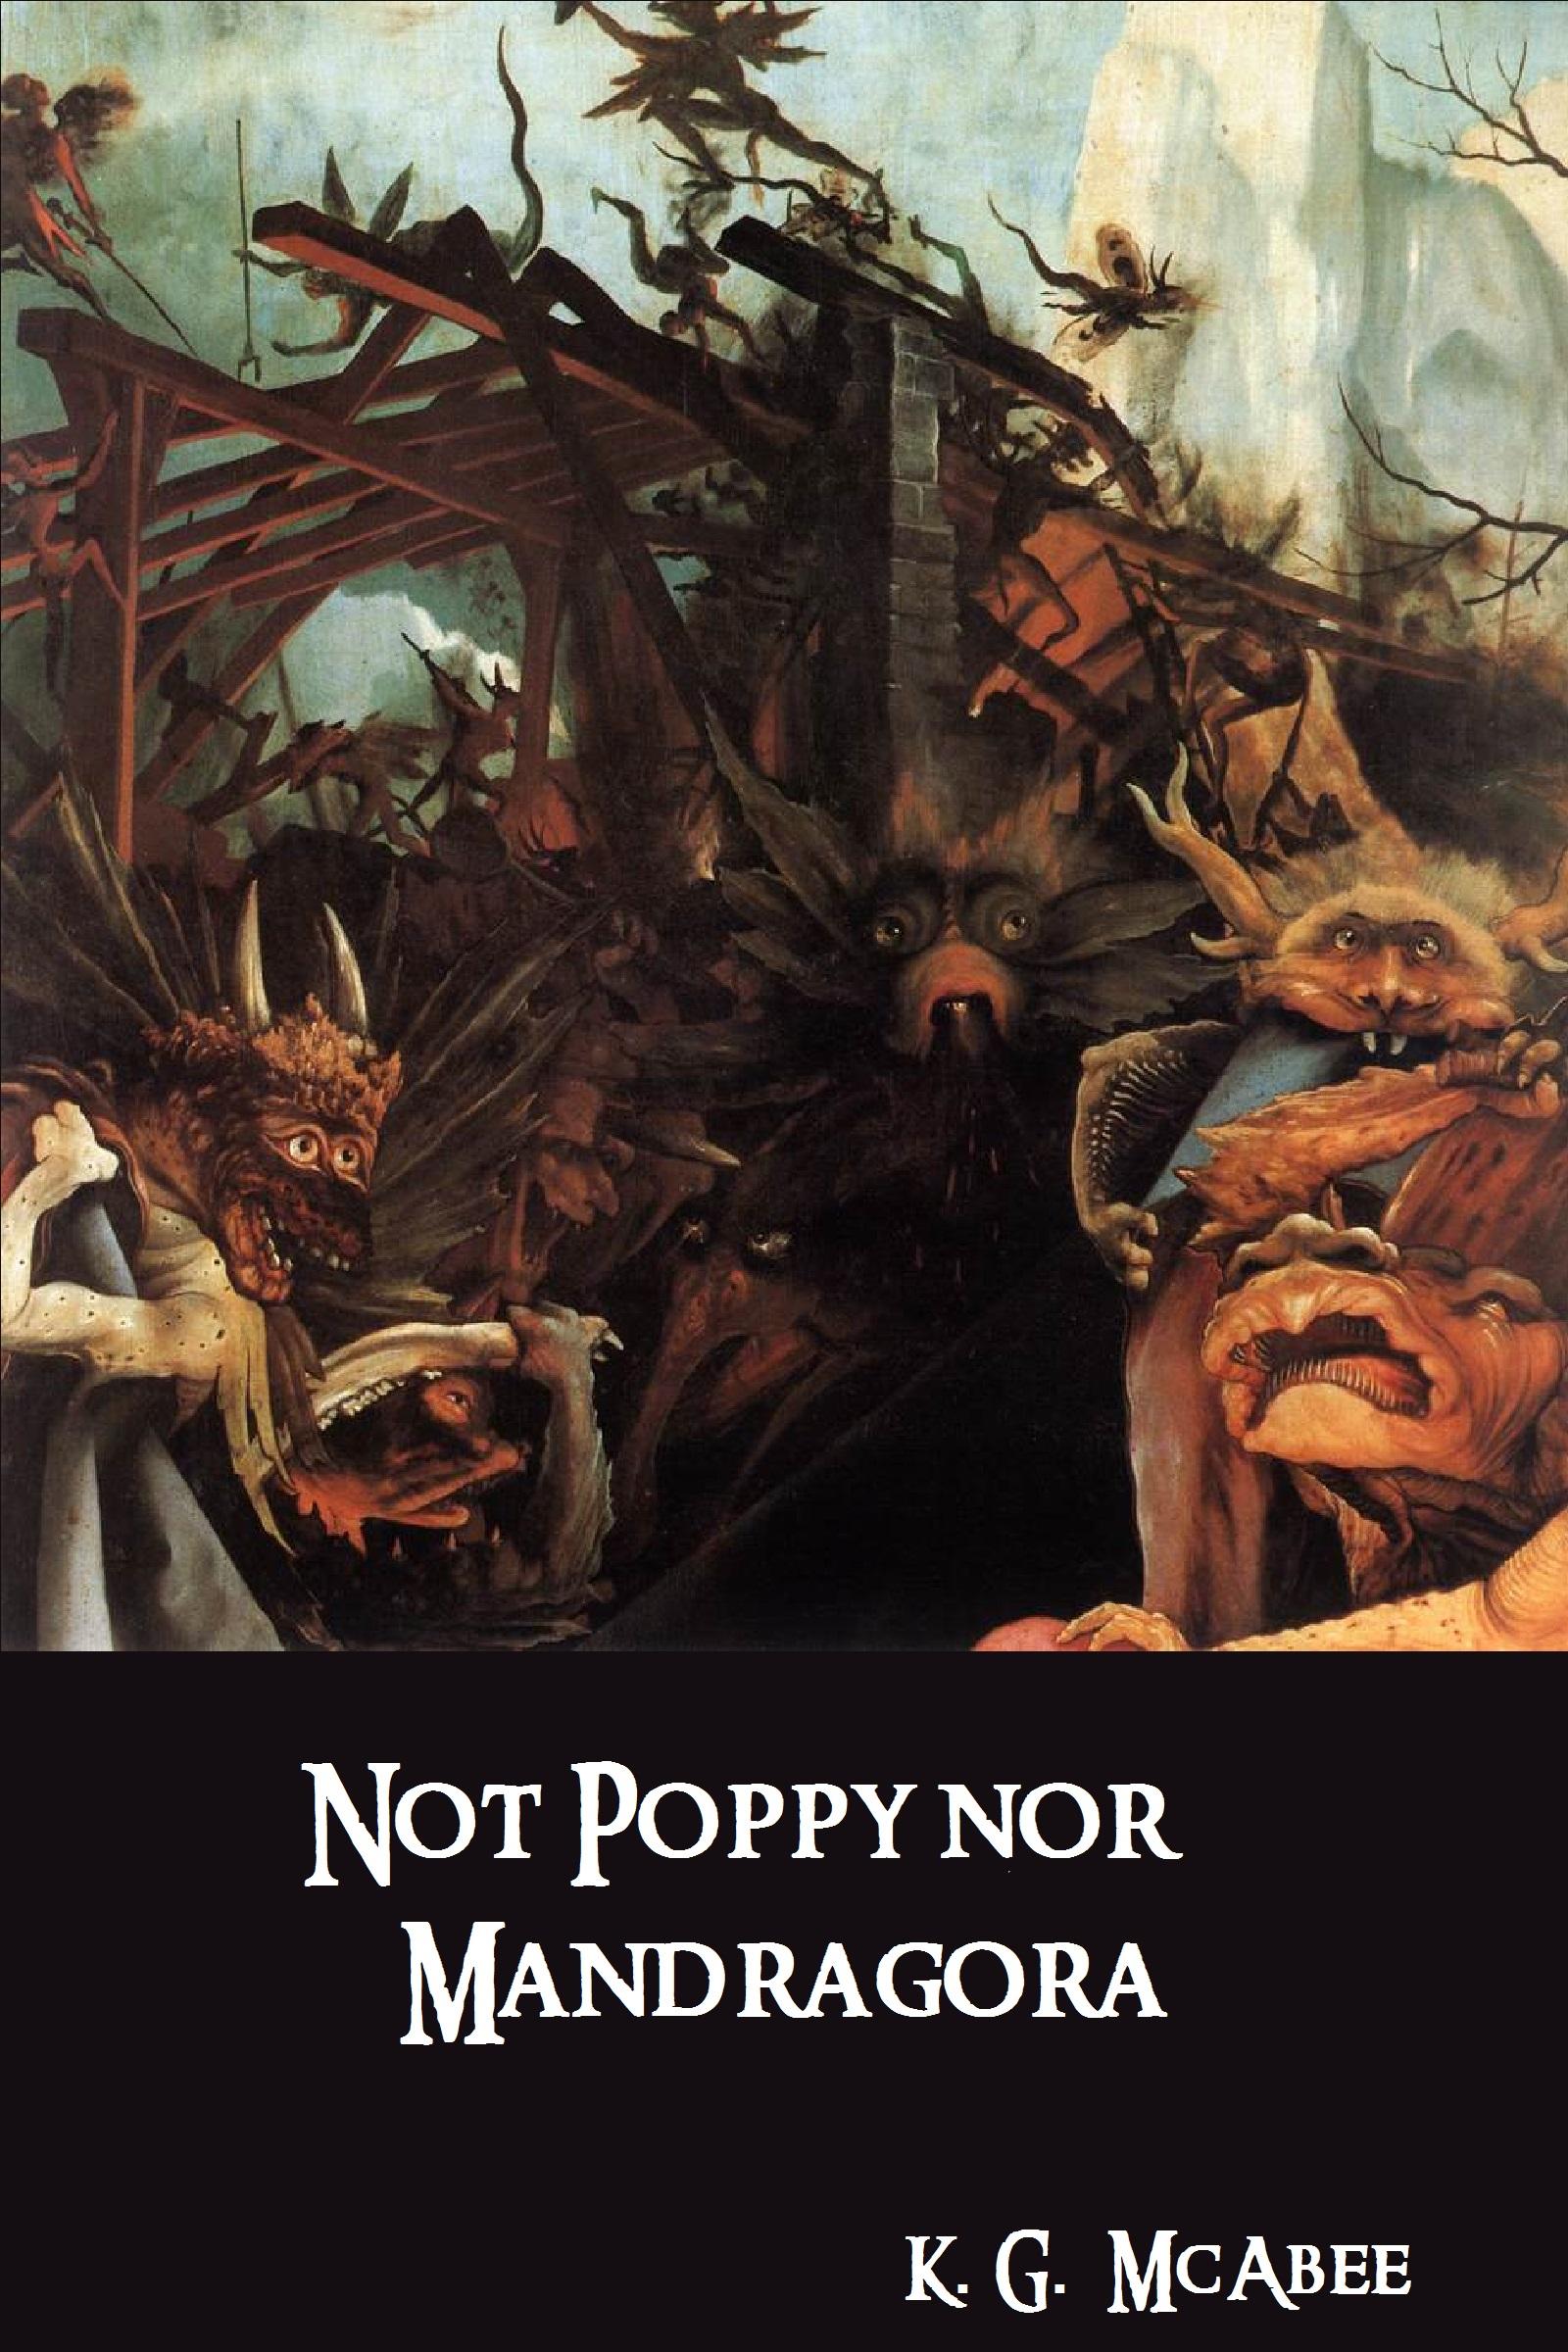 poppy mandragora